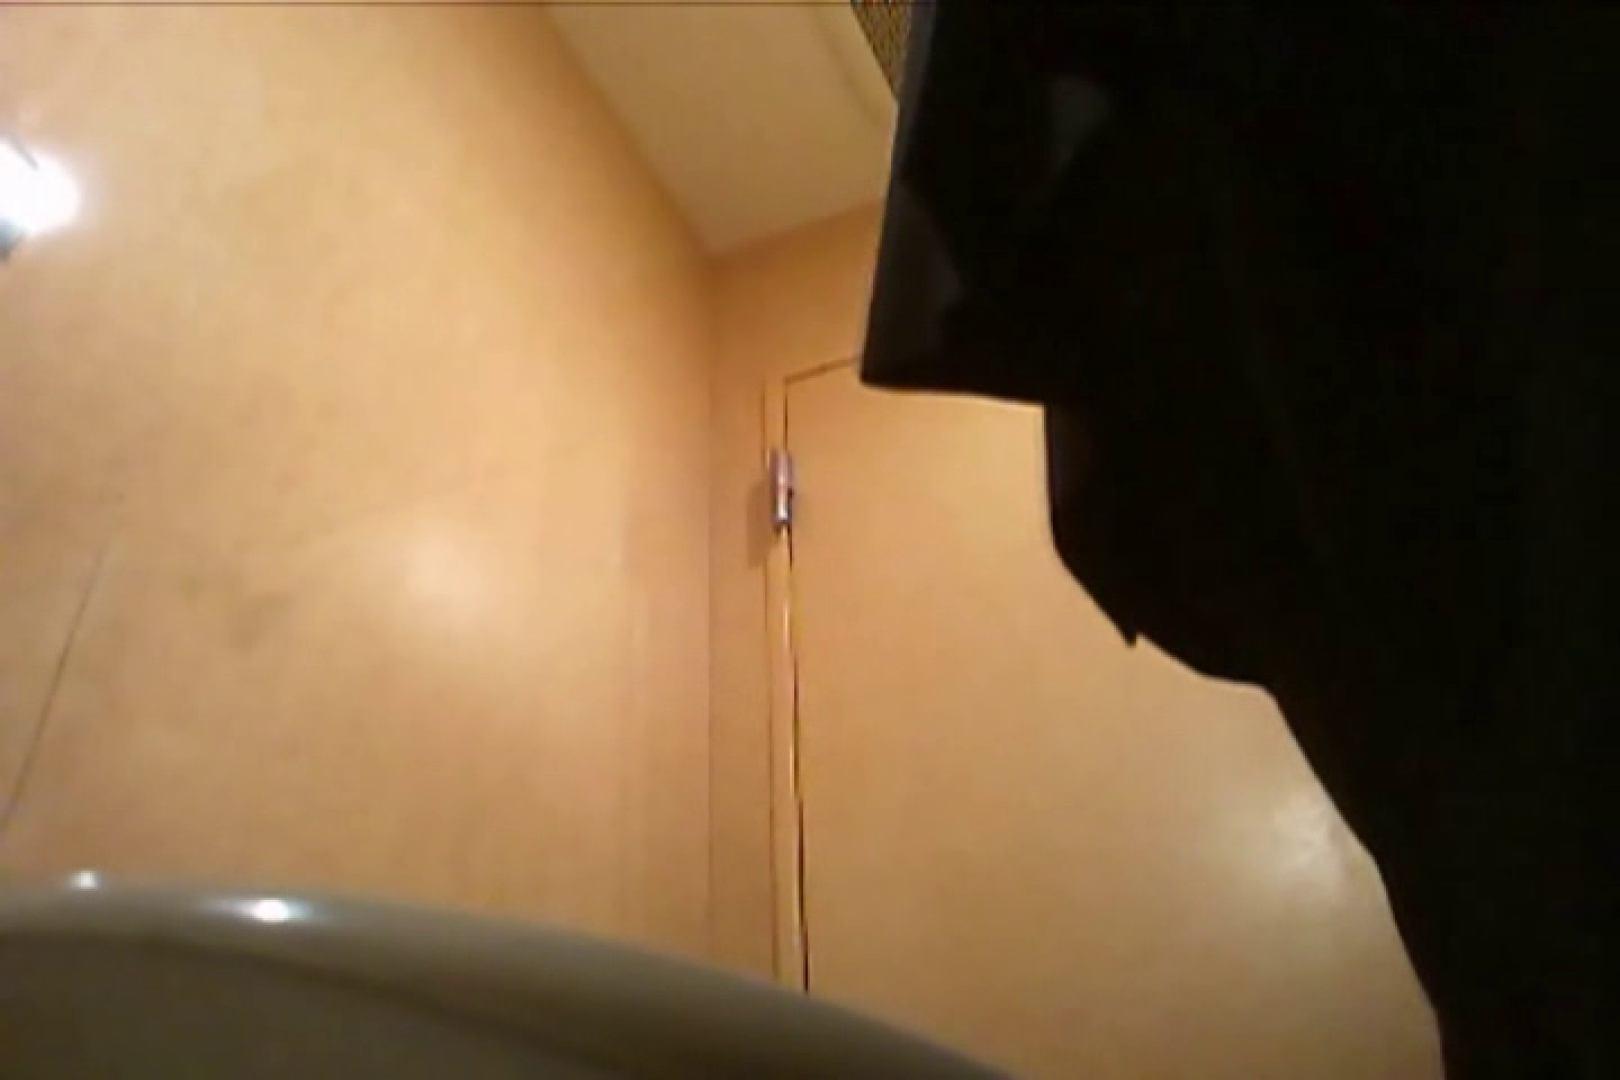 SEASON 2ND!掴み取りさんの洗面所覗き!in新幹線!VOL.08 サル系な男たち ゲイAV画像 102連発 10